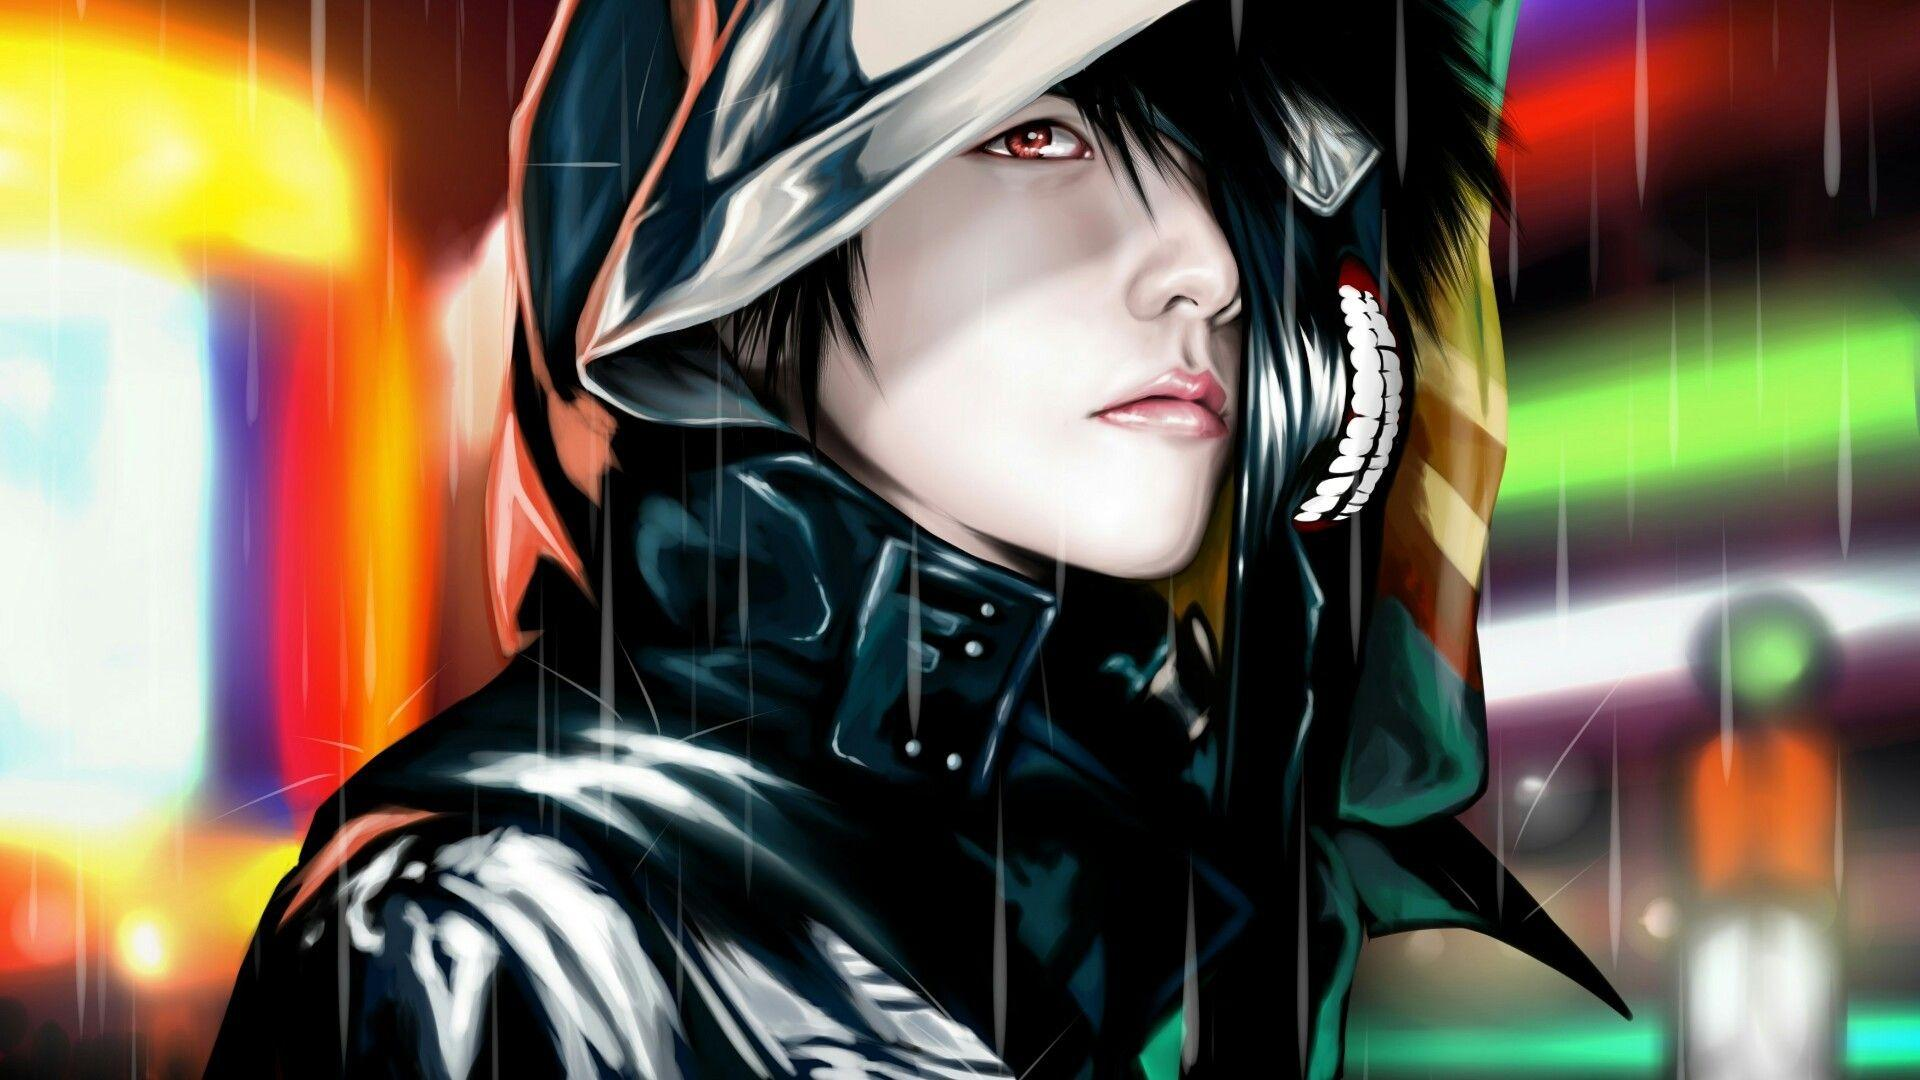 3d Anime Wallpaper Backgrounds gambar ke 14